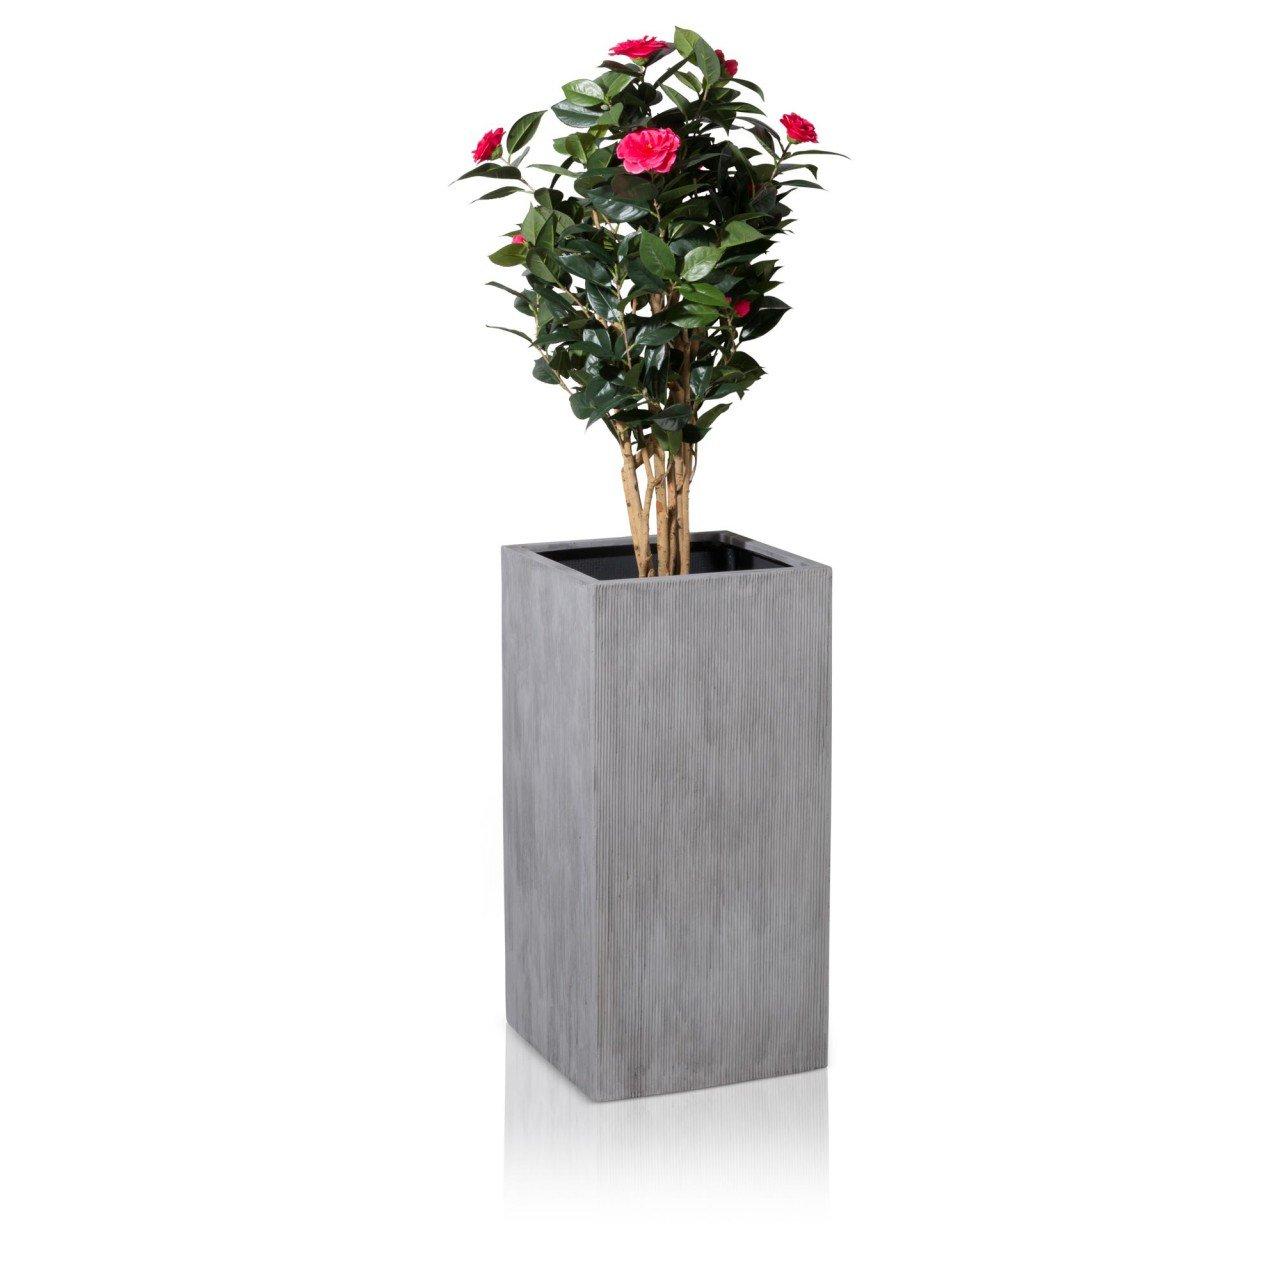 Pflanzkübel Blumenkübel TORRE 80 Fiberglas, 40x40x80 cm, grau ...